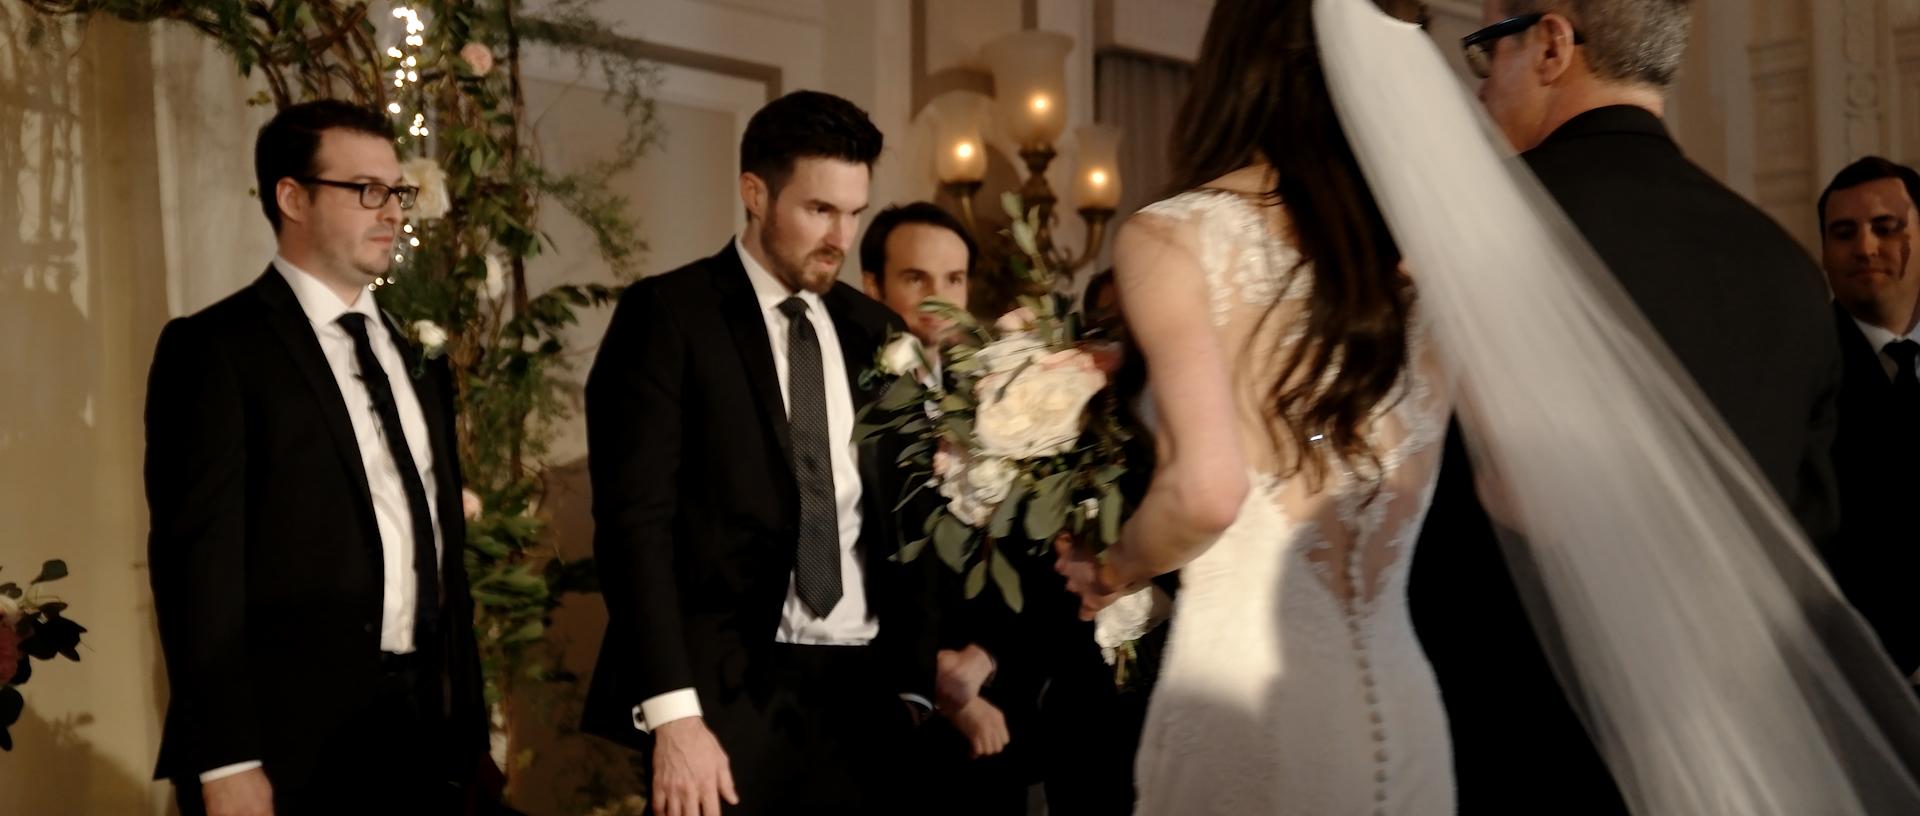 Atlanta Wedding Videographer0016.jpg